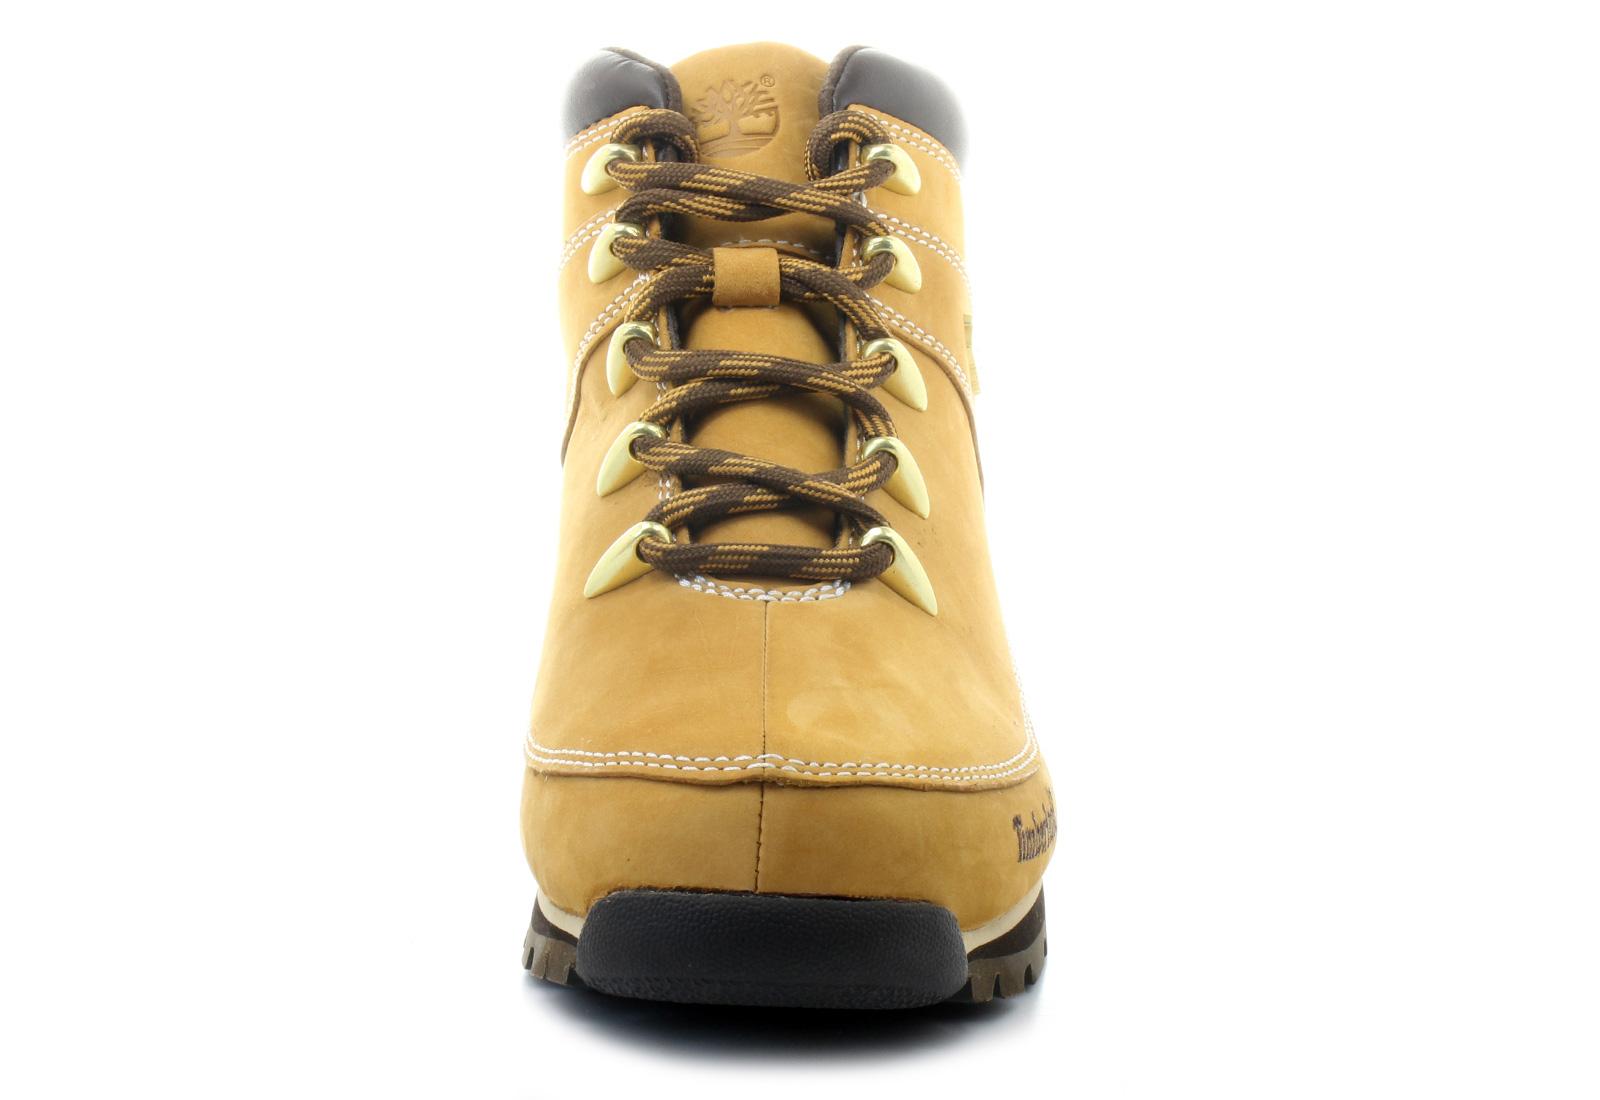 Timberland Boots Euro Sprint Hiker A122i Whe Online